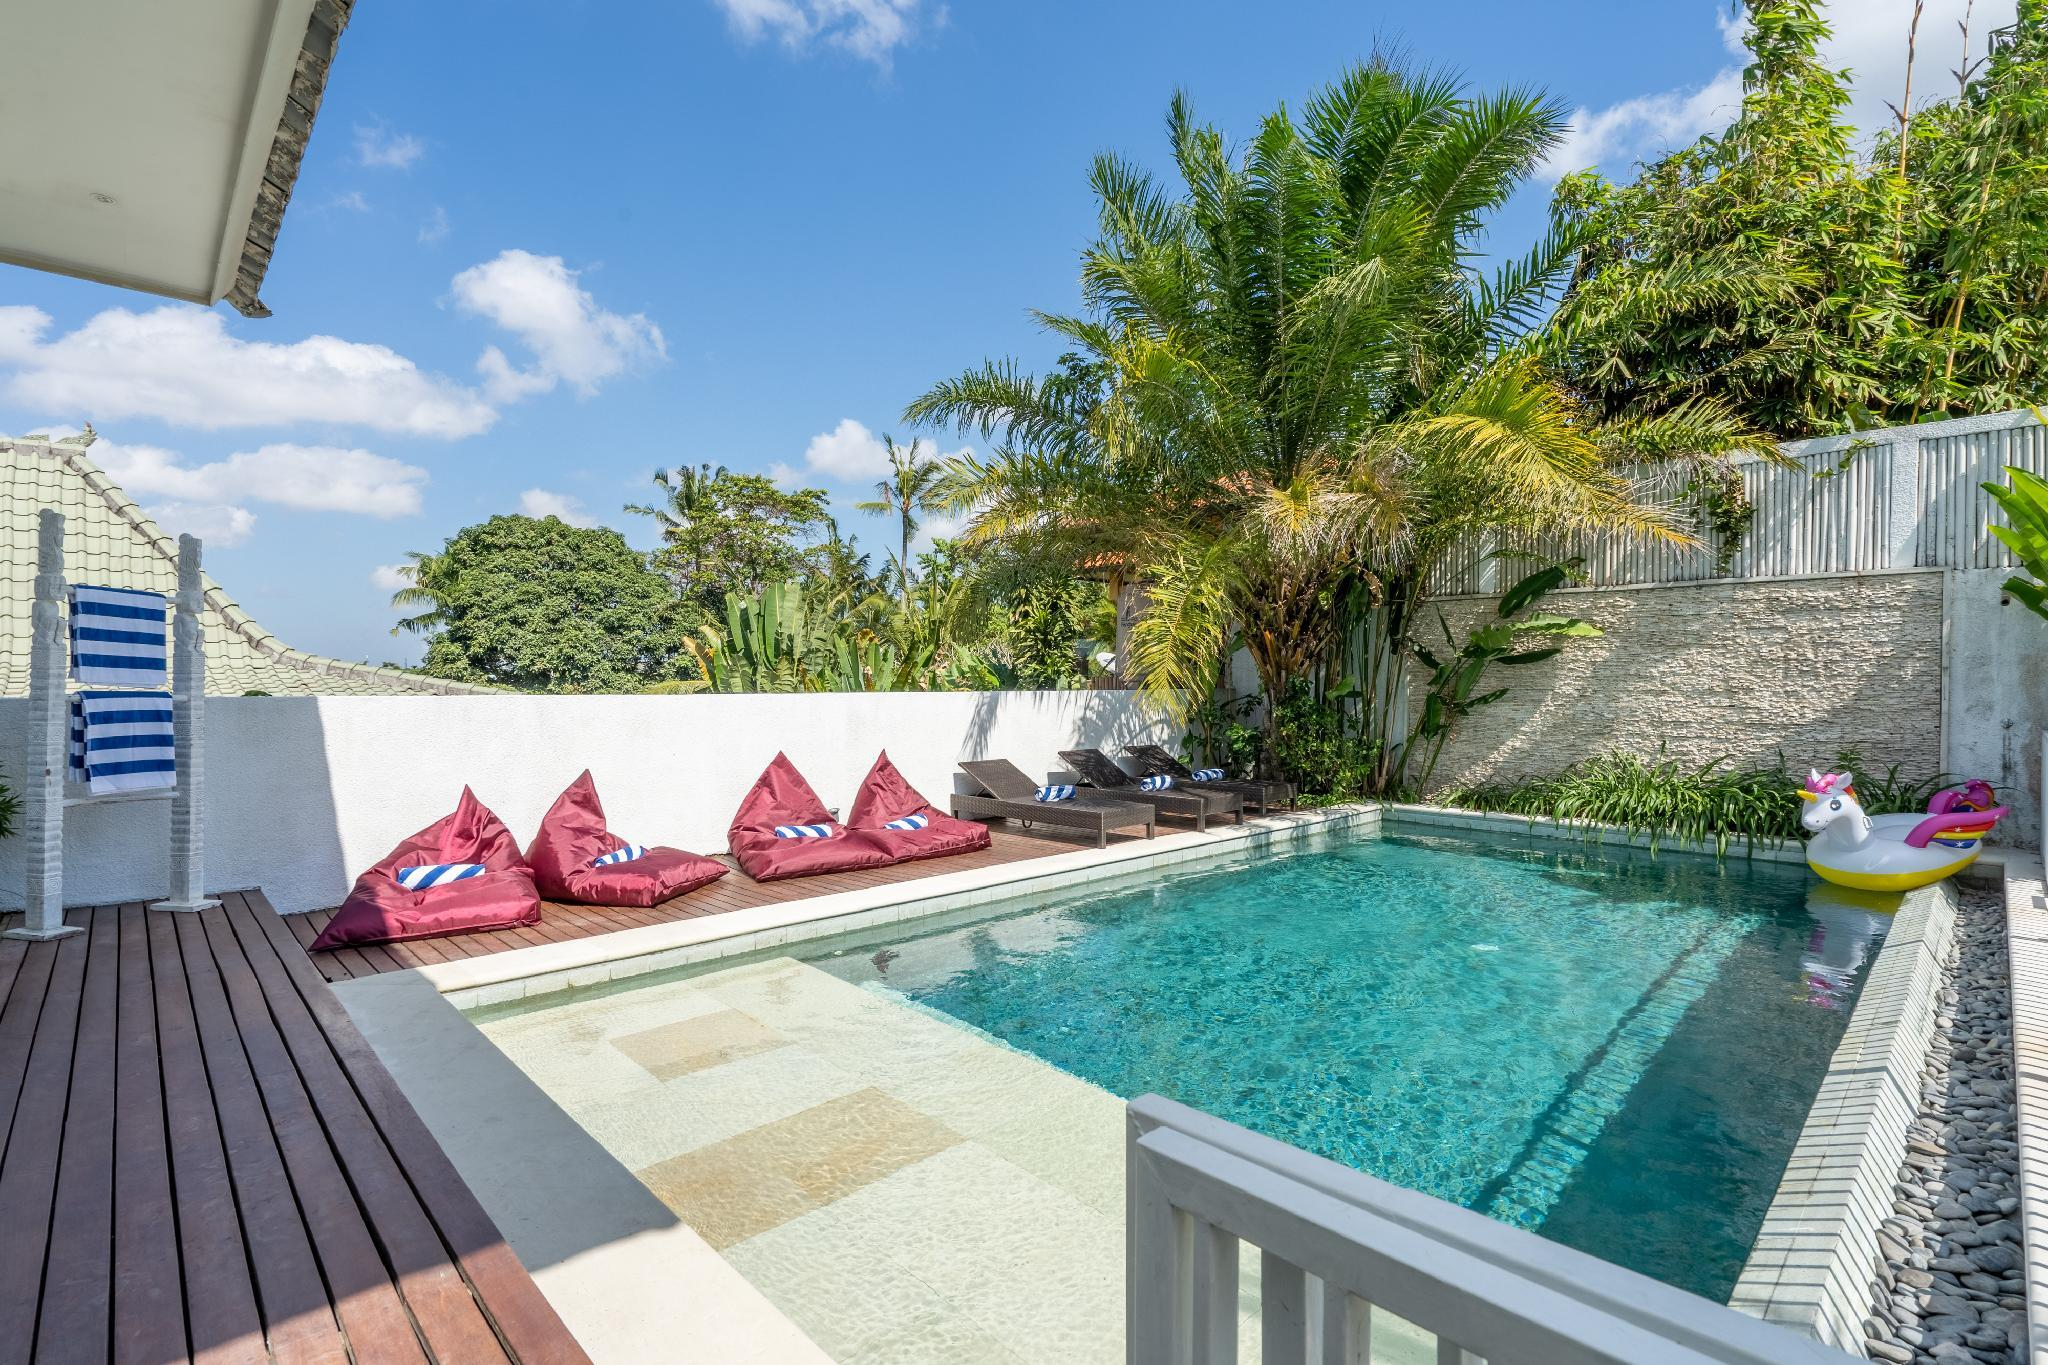 Brand New 3Bedroom Villa Private Pool Fenced